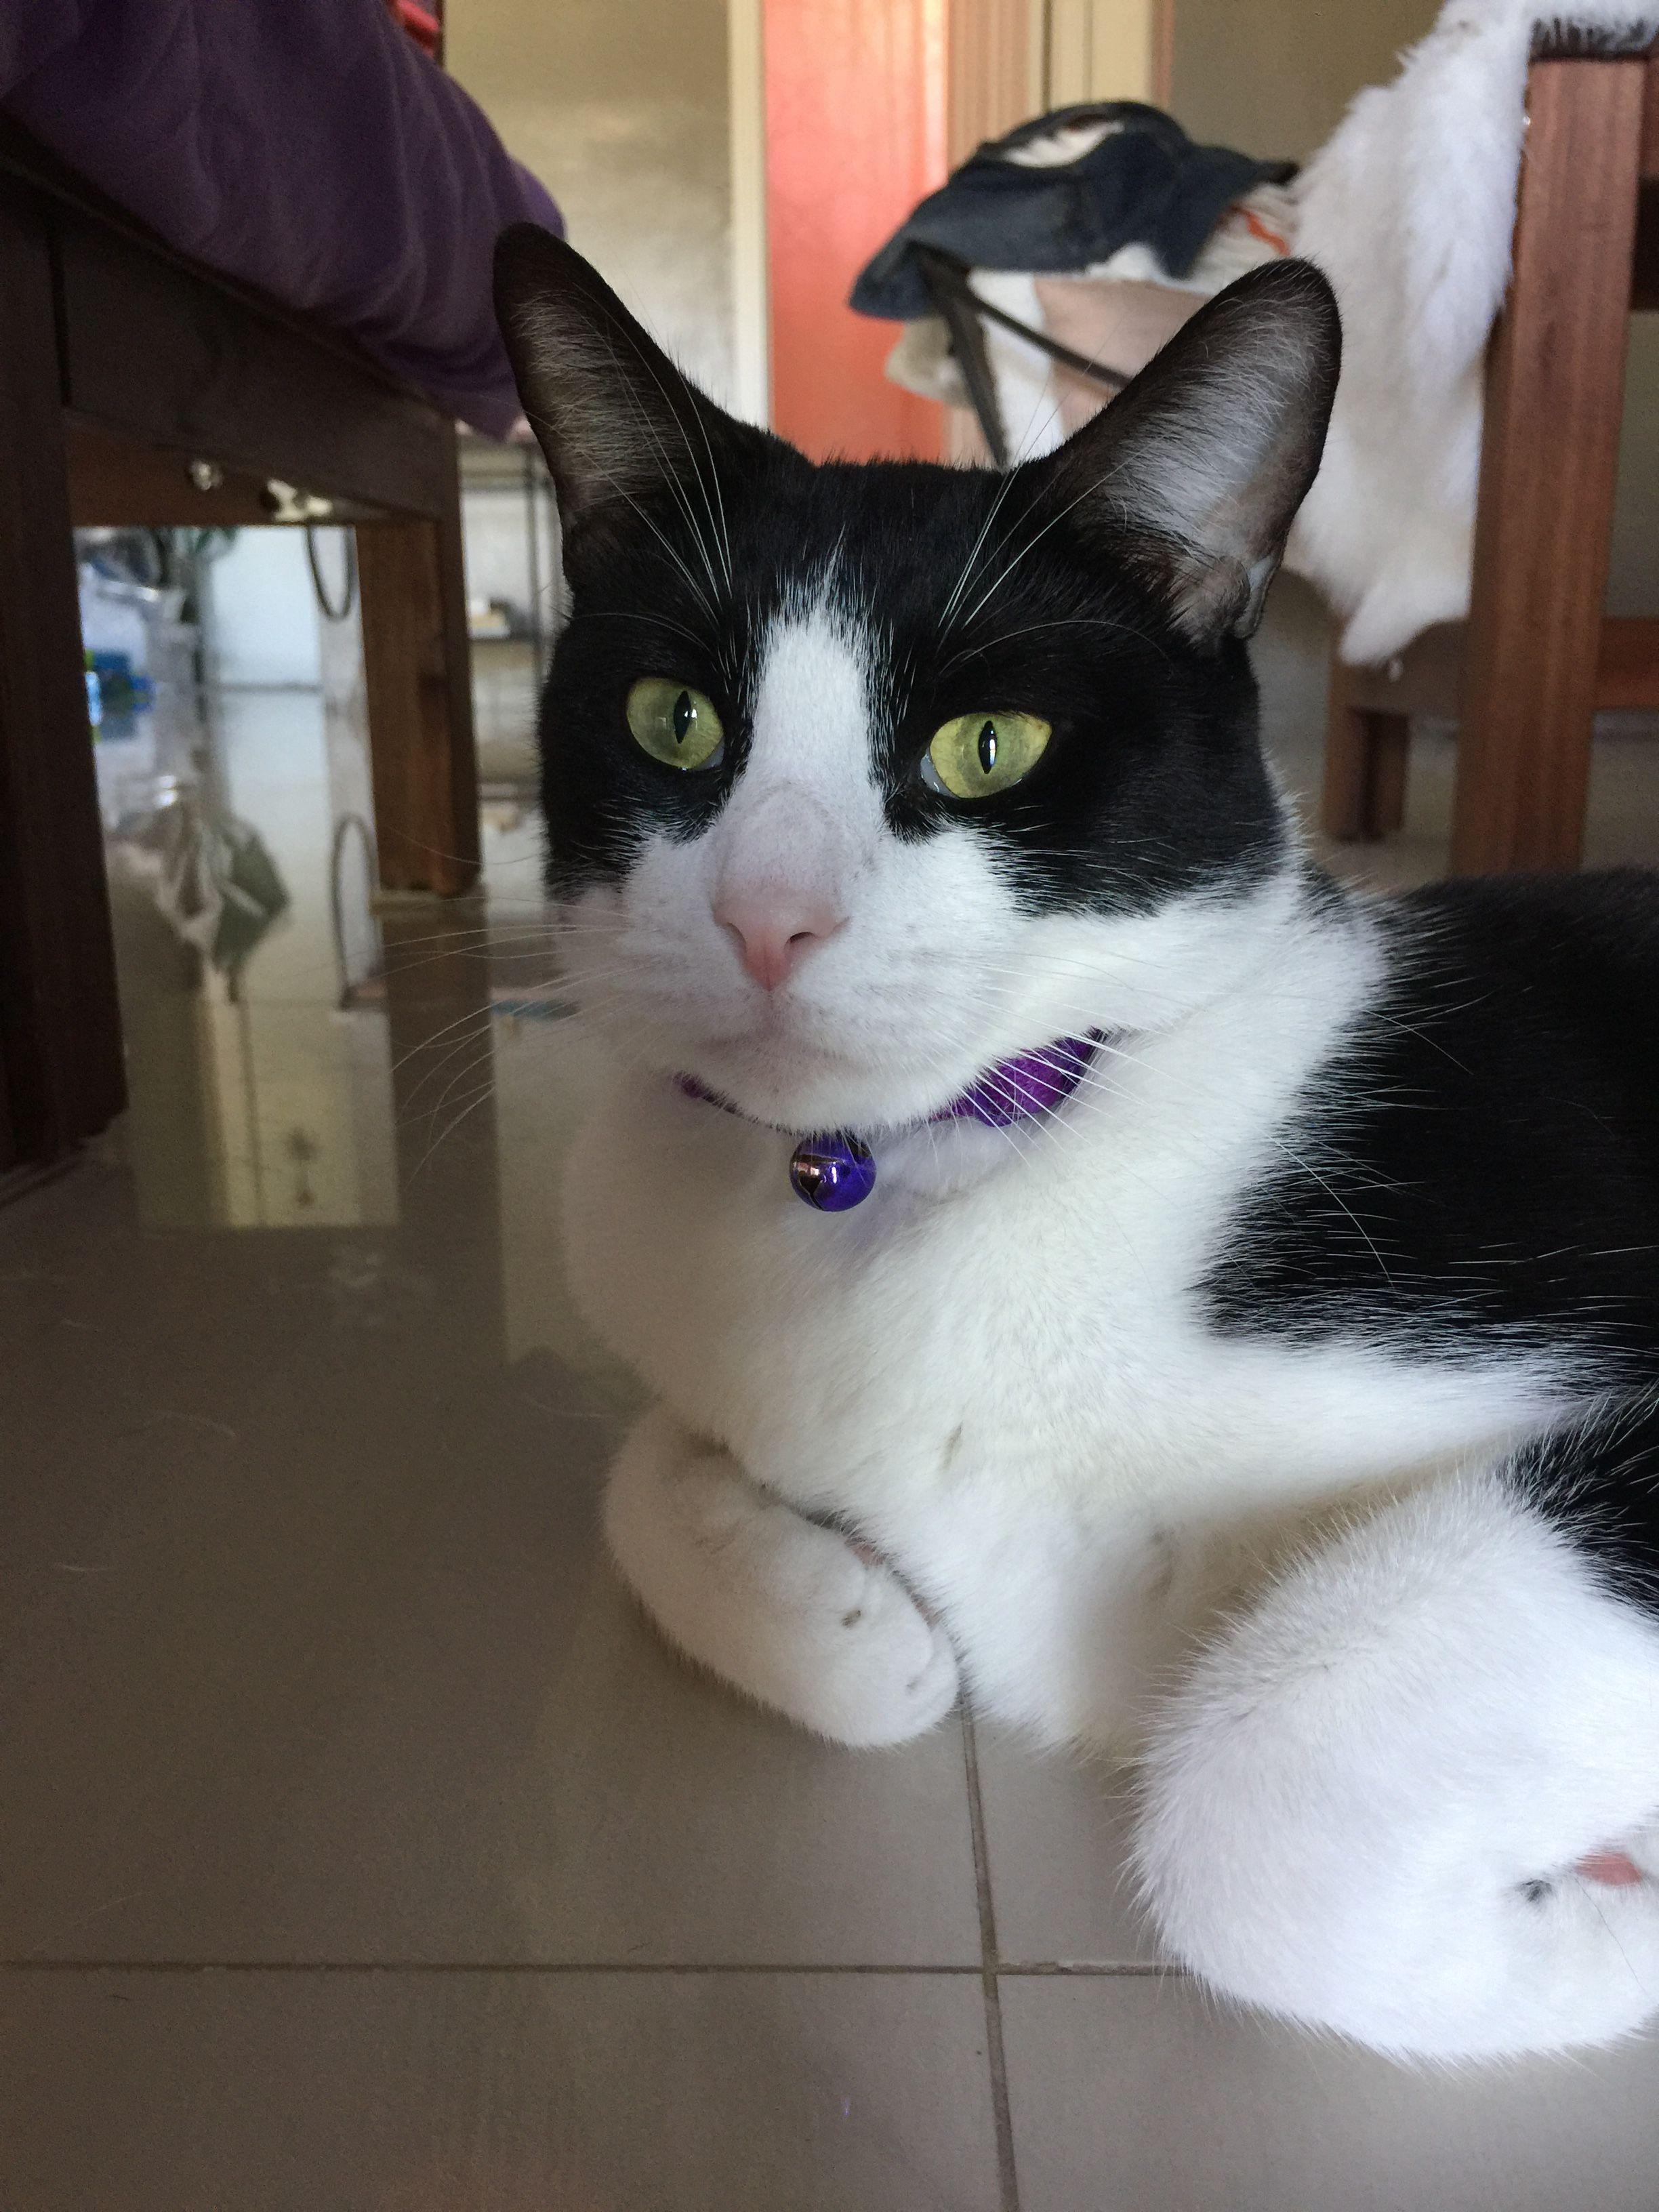 That purple color looks wonderful on a tuxedo cat. Cat